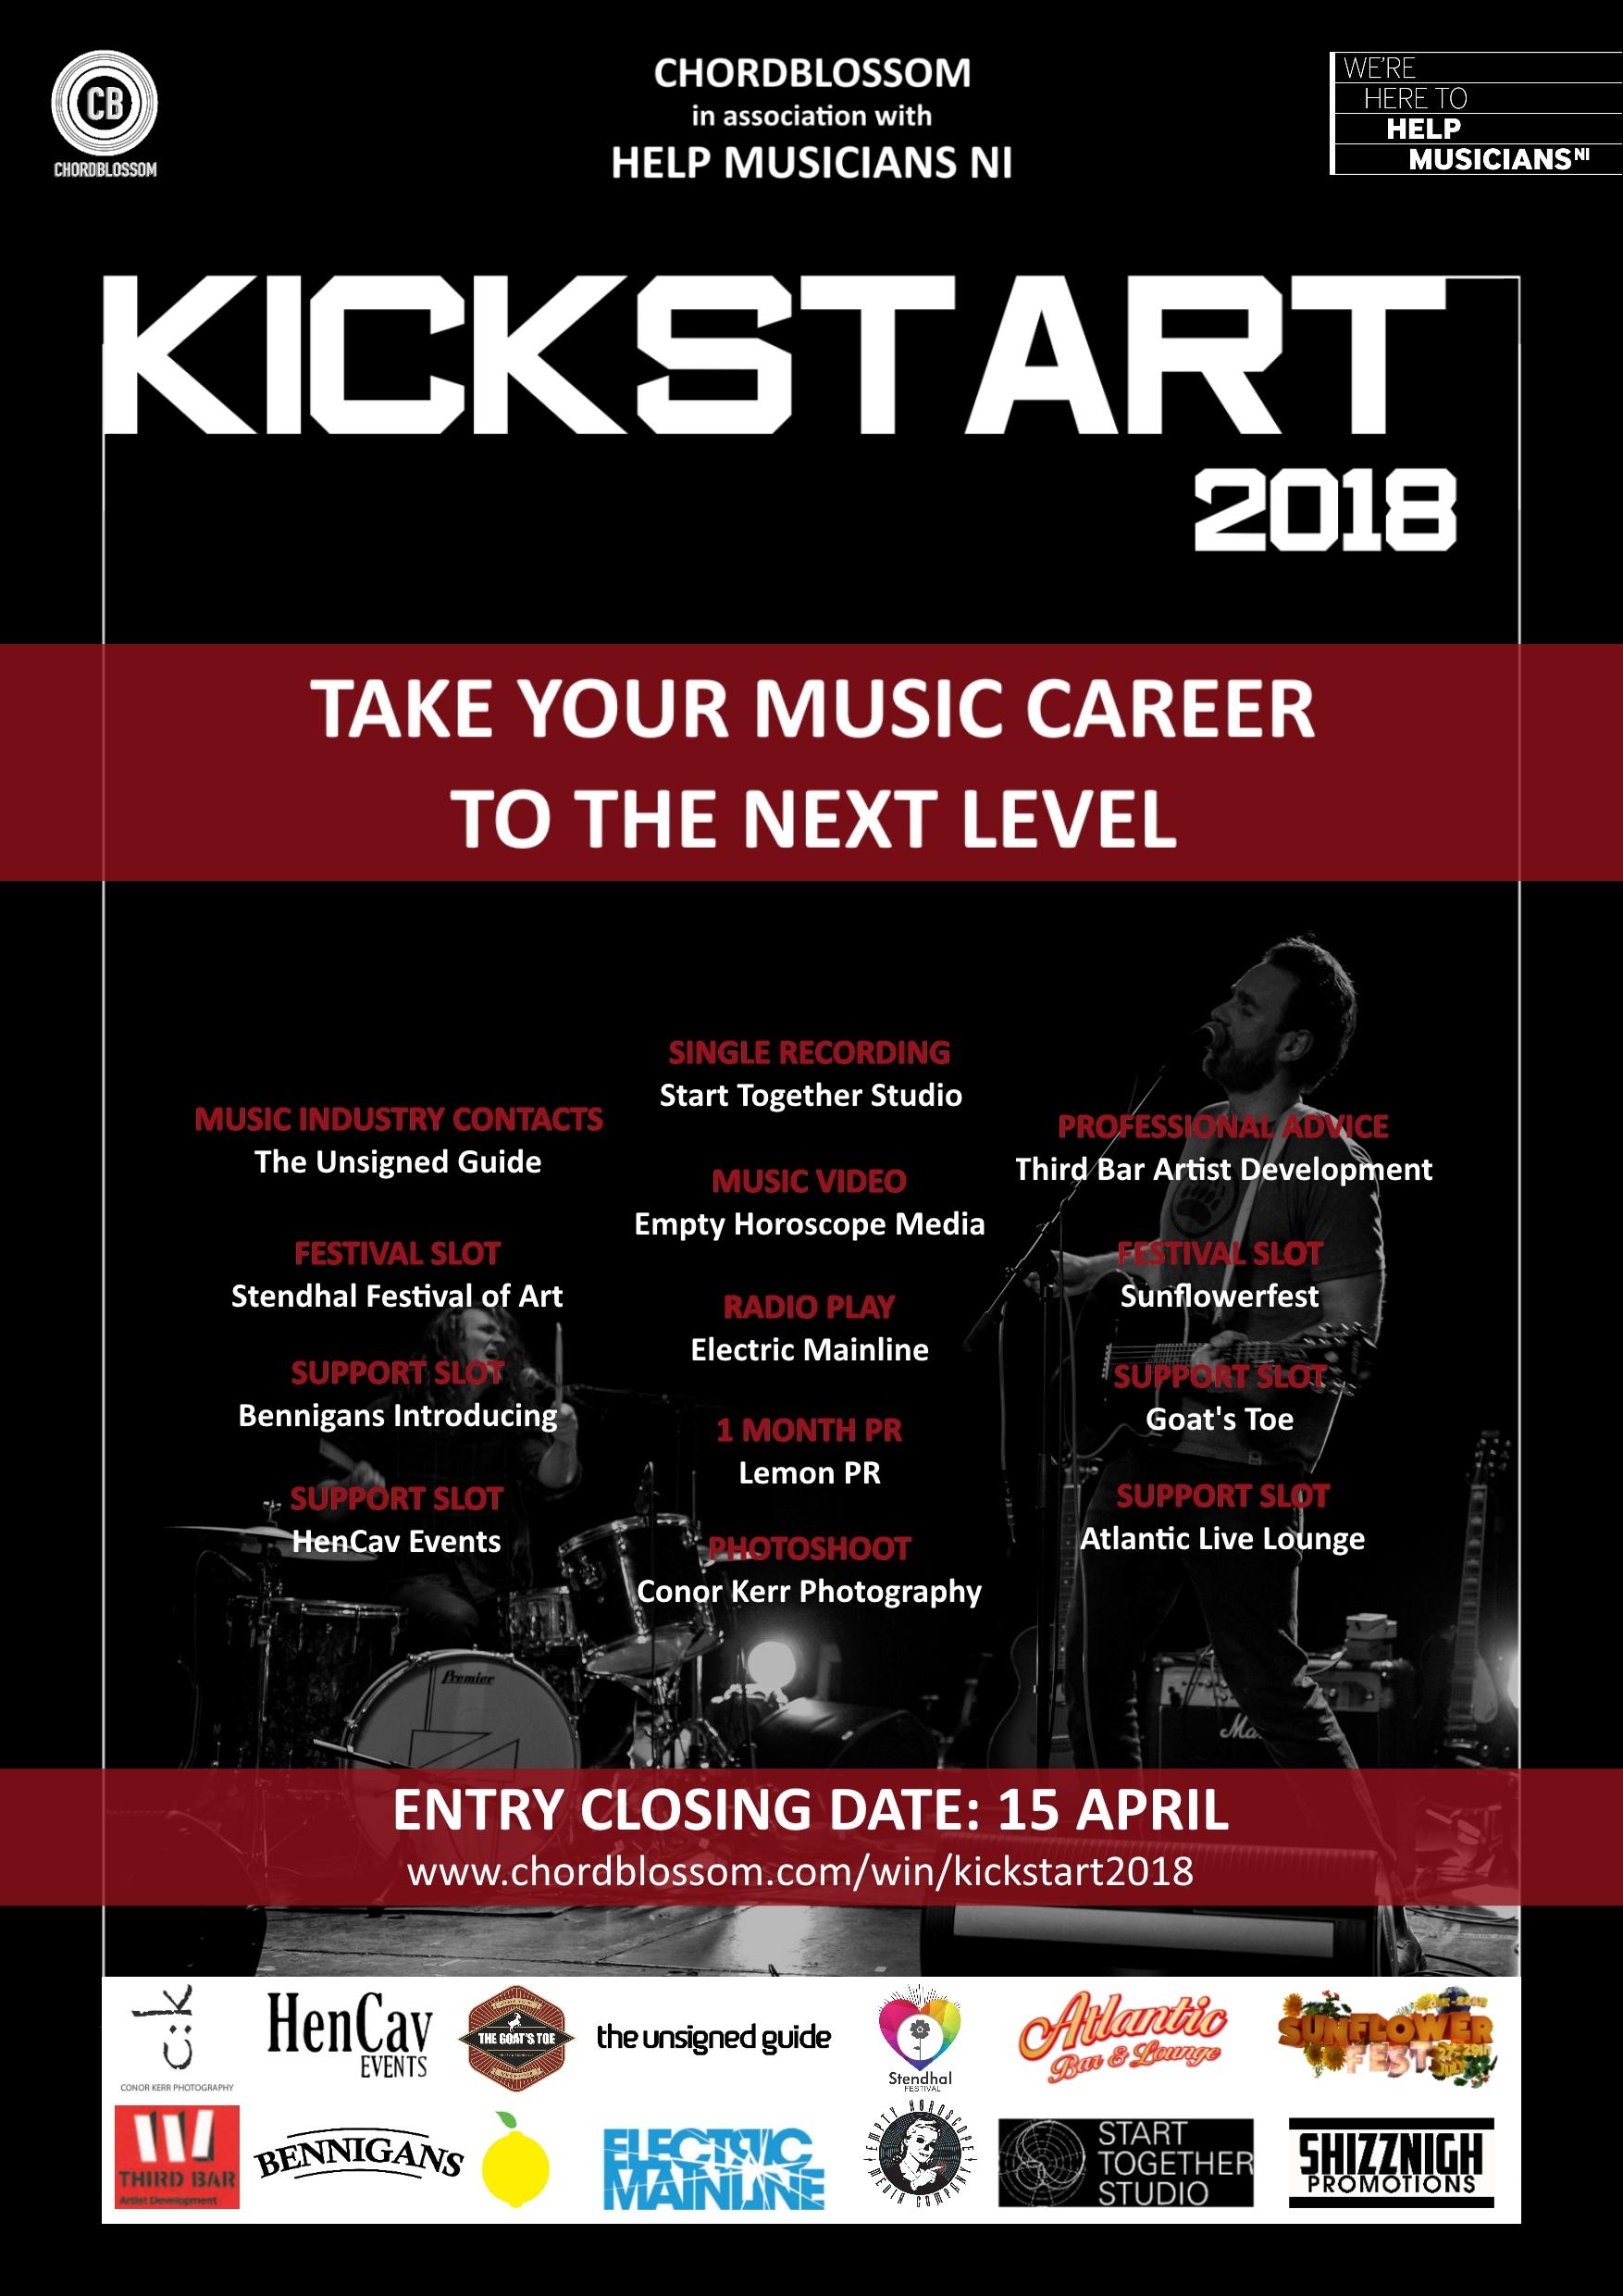 Chordblossom Kickstart 2018 poster